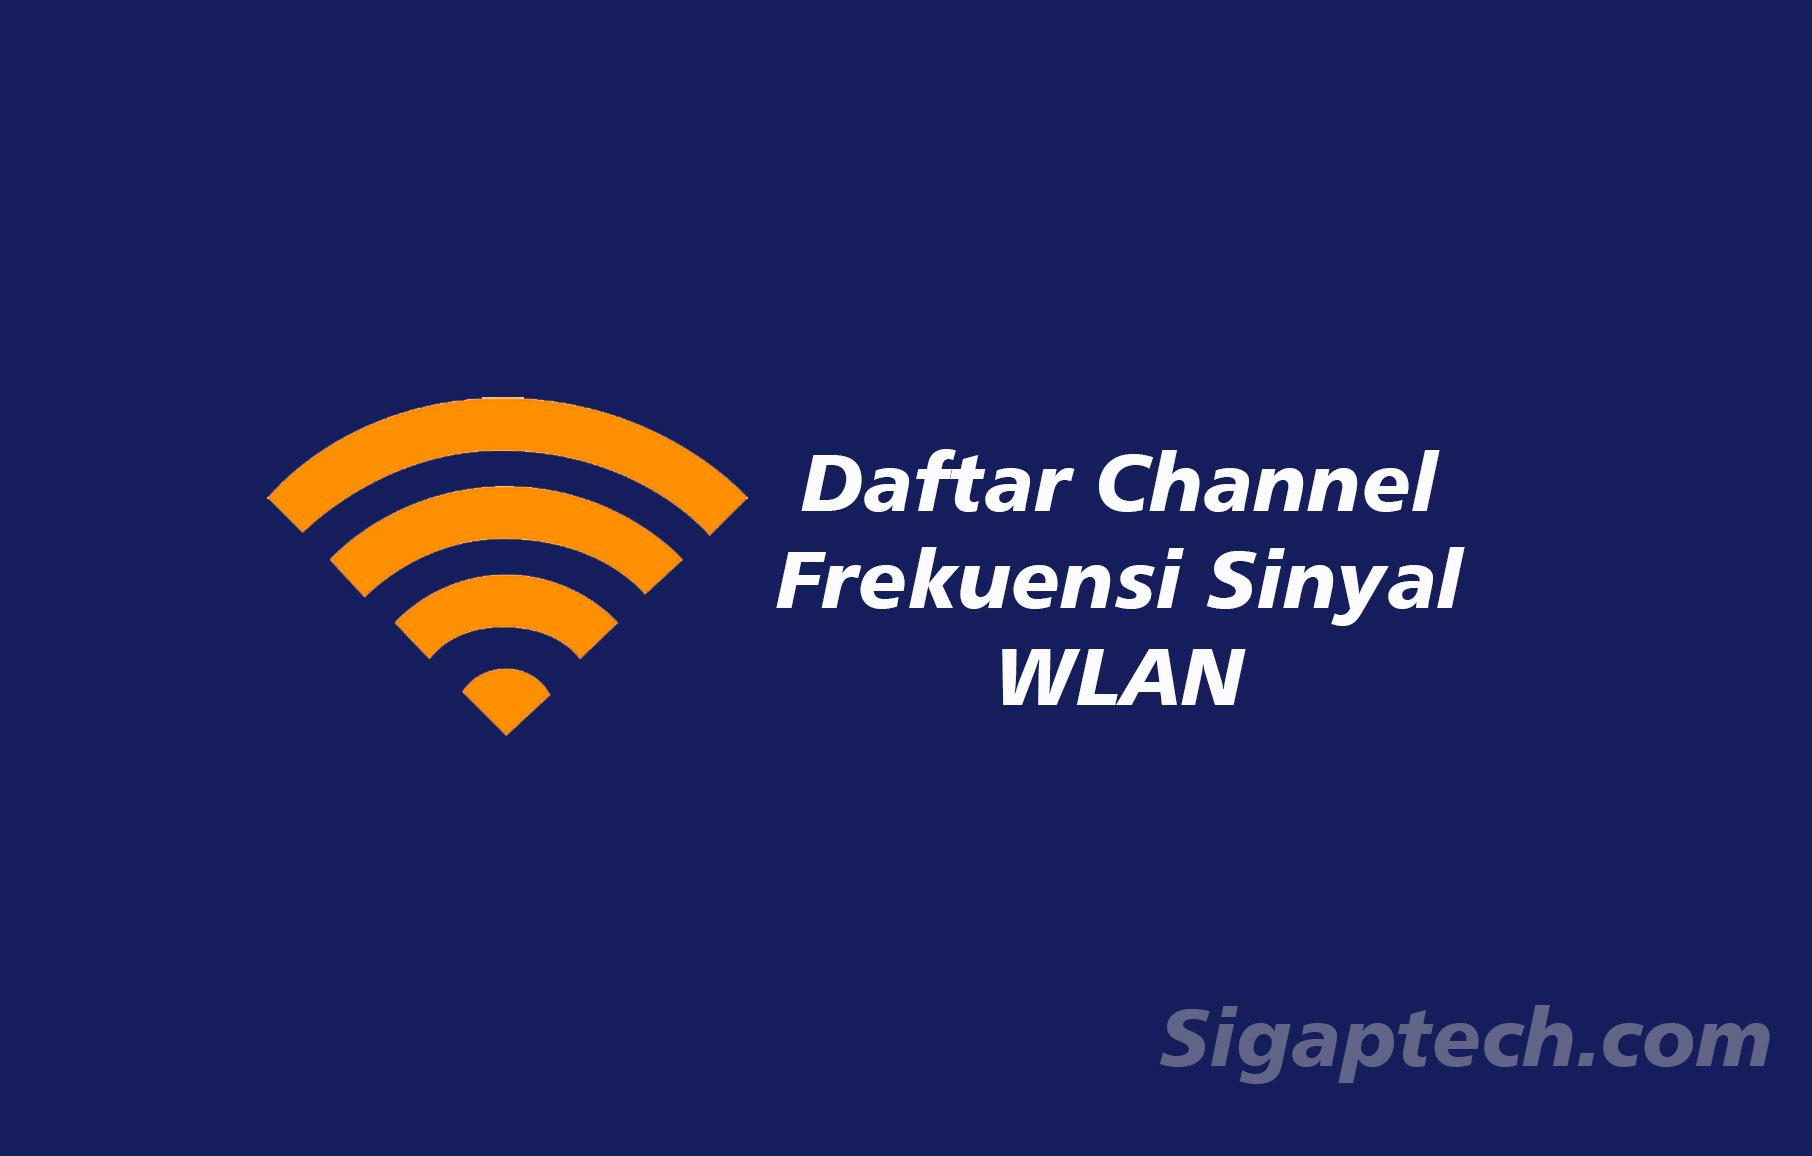 Daftar Channel Frekuensi Sinyal WLAN